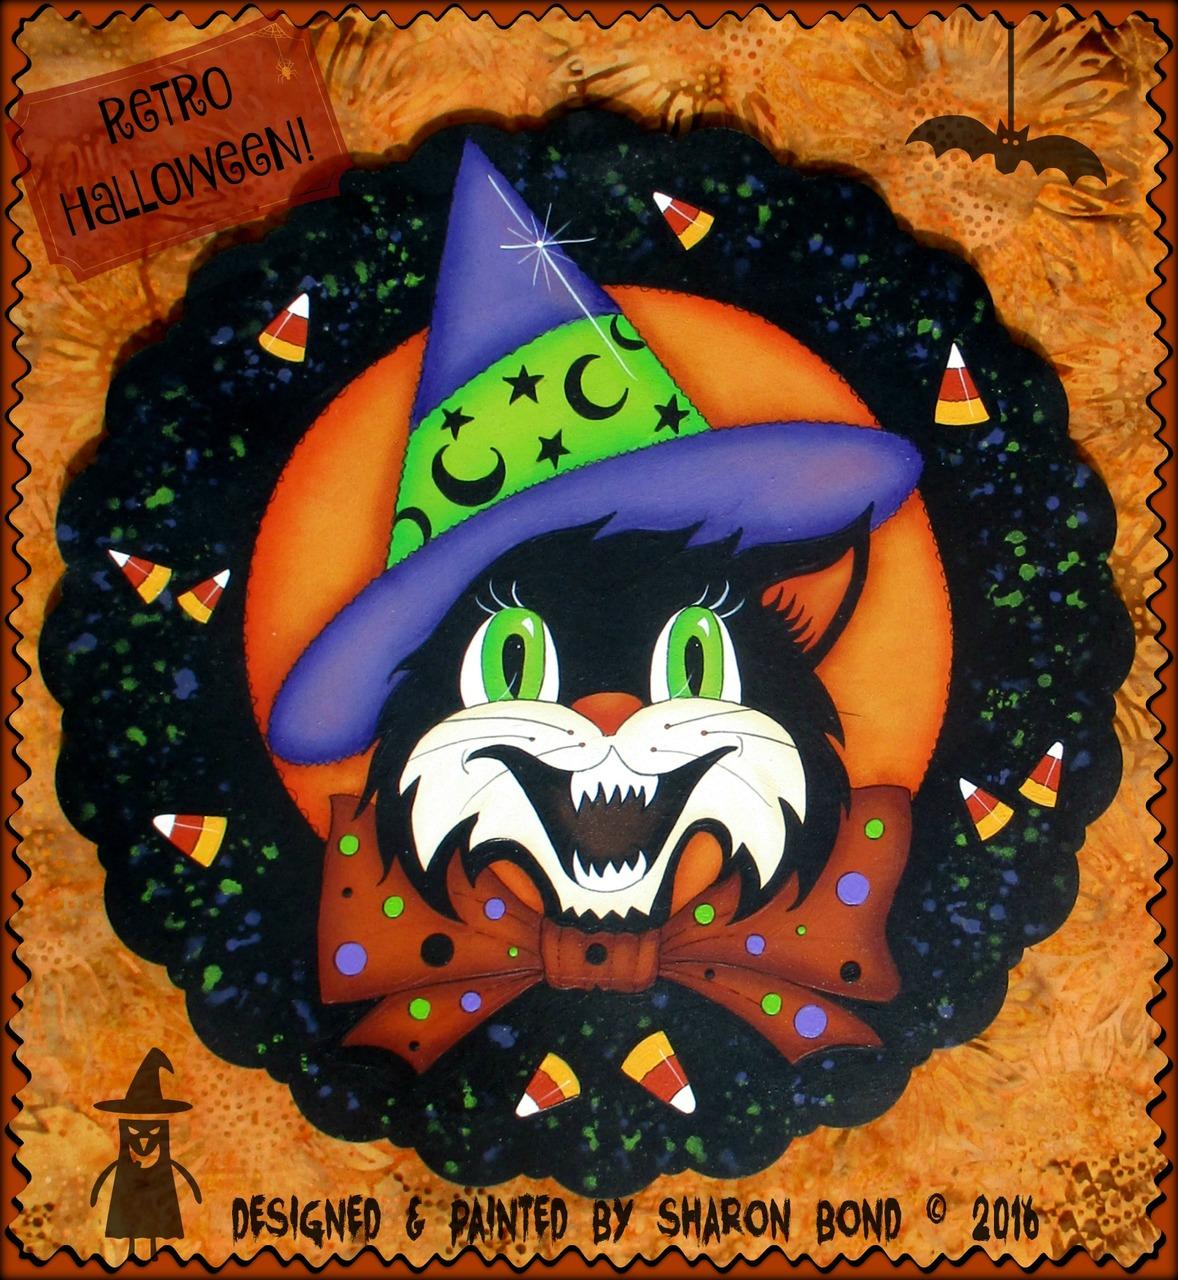 Retro Halloween Wreath - E-Packet - Sharon Bond